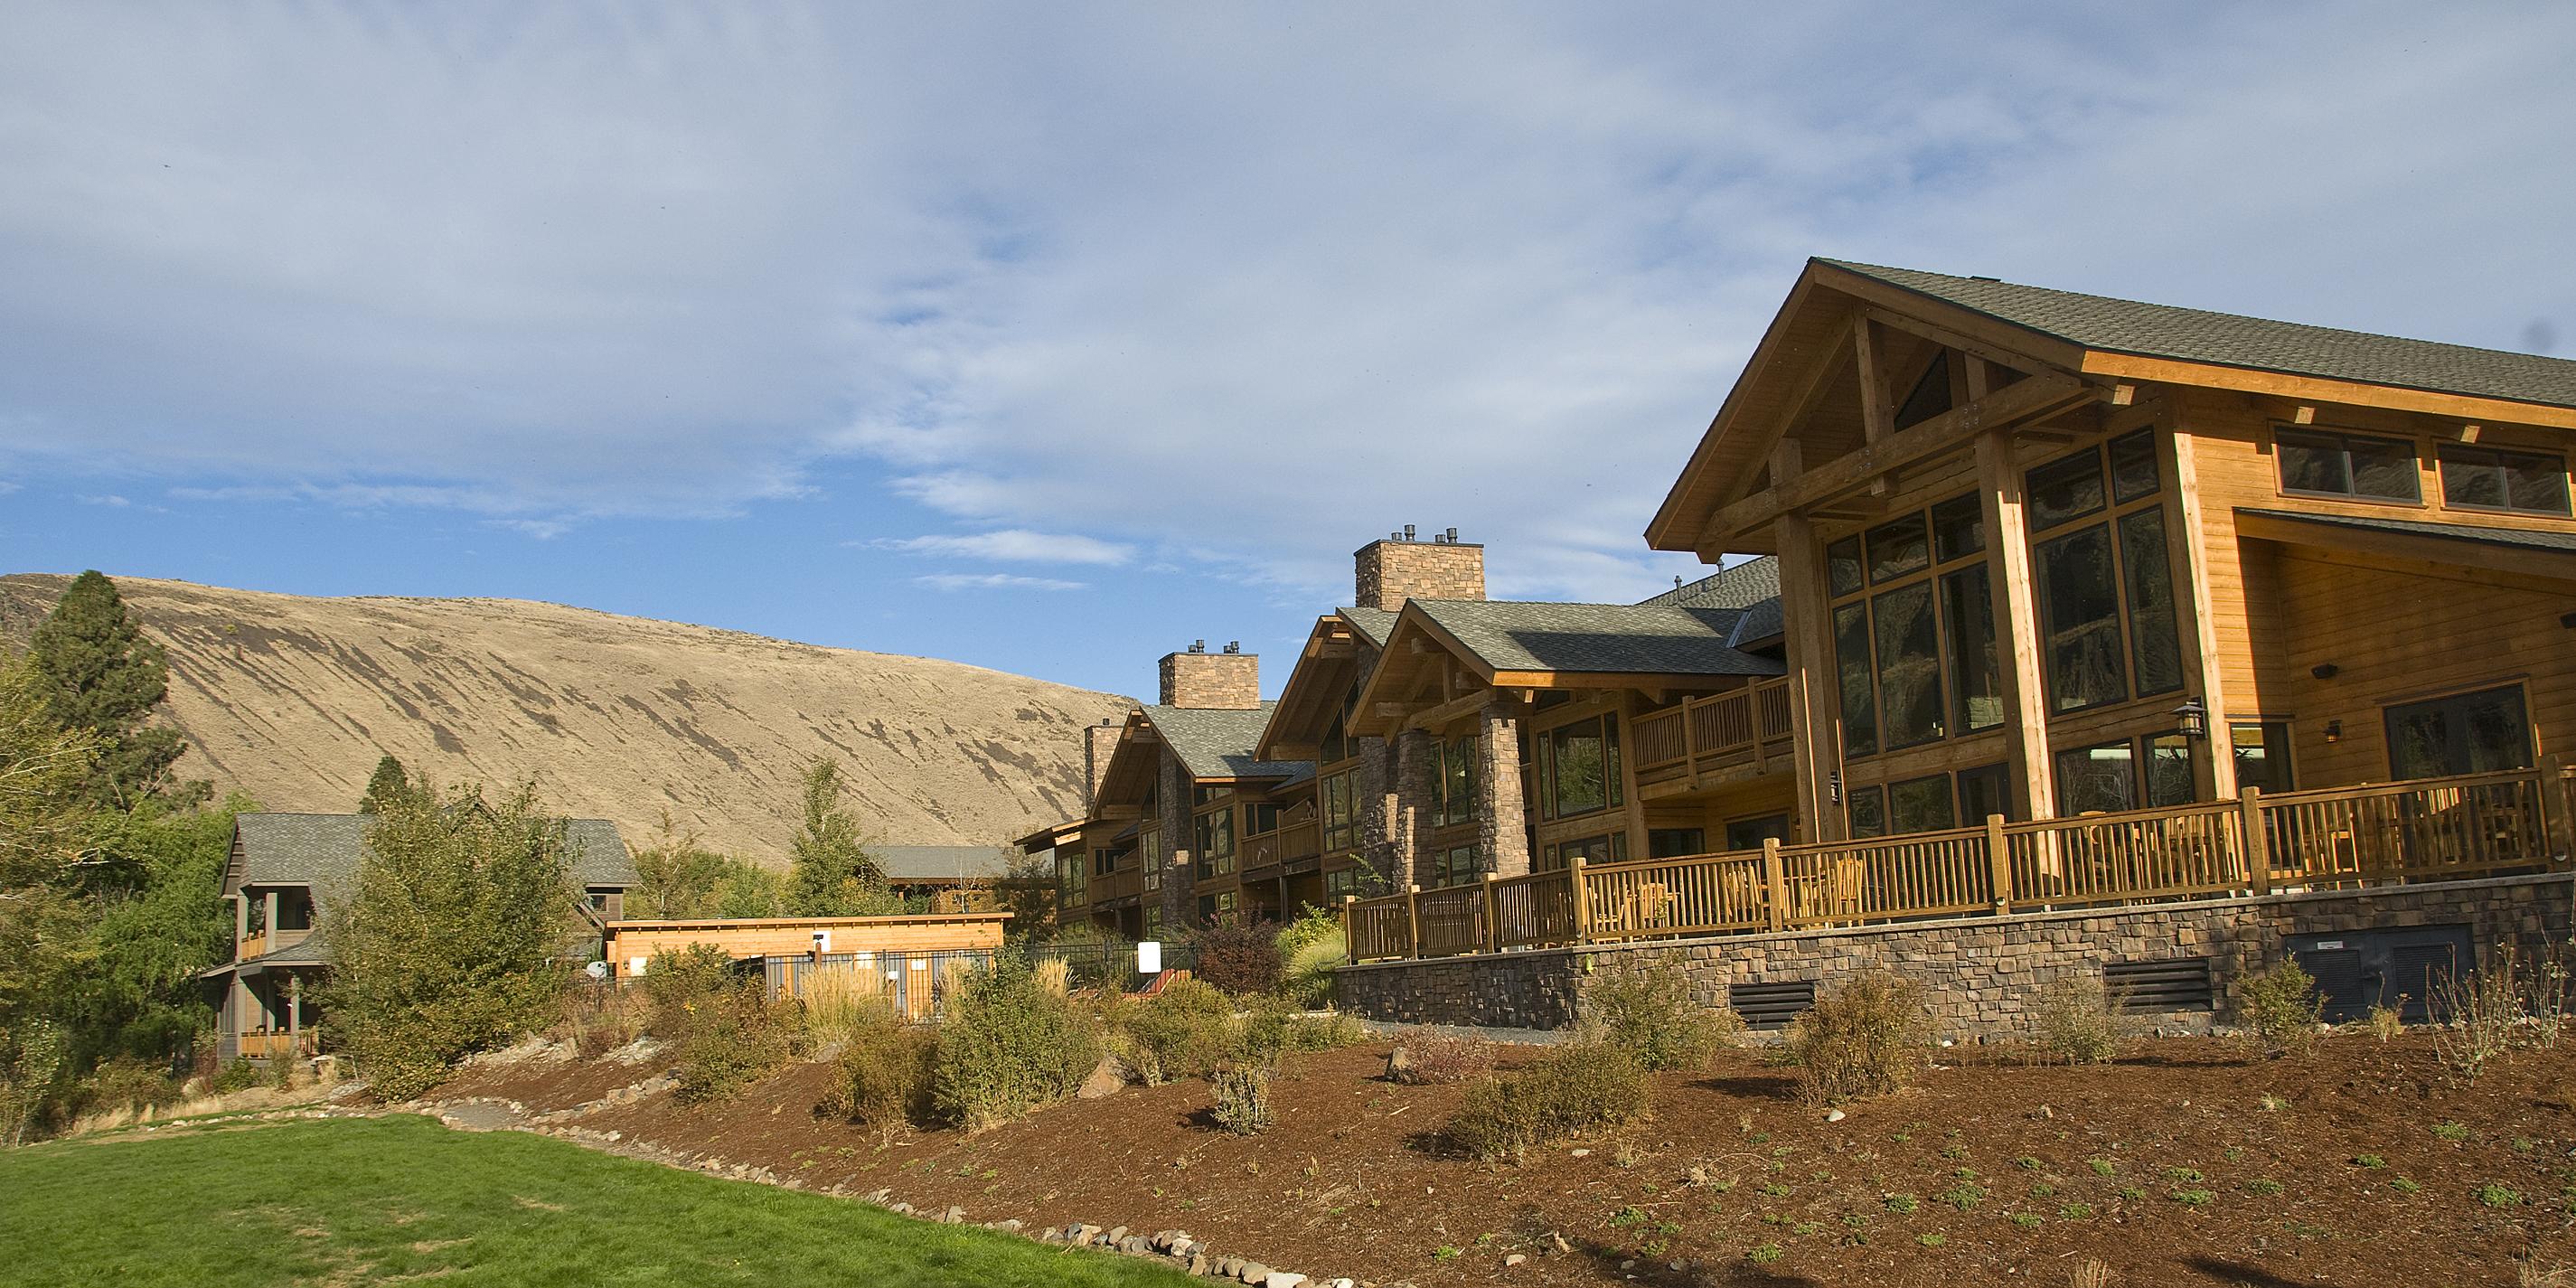 Reds Lodge (Yakima Canyon)